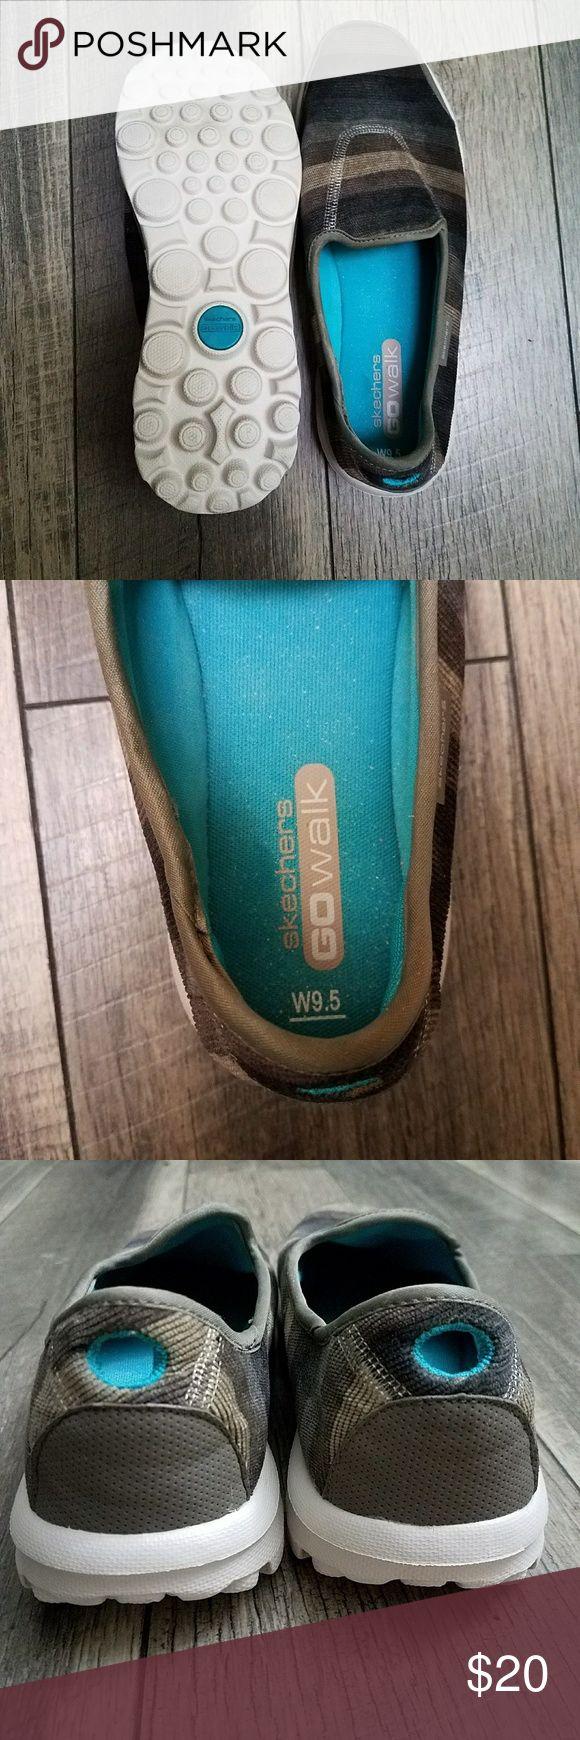 Skechers Go Walk Striped Slip On Shoes Striped Skechers Go Walk slip on shoes Skechers Shoes Athletic Shoes